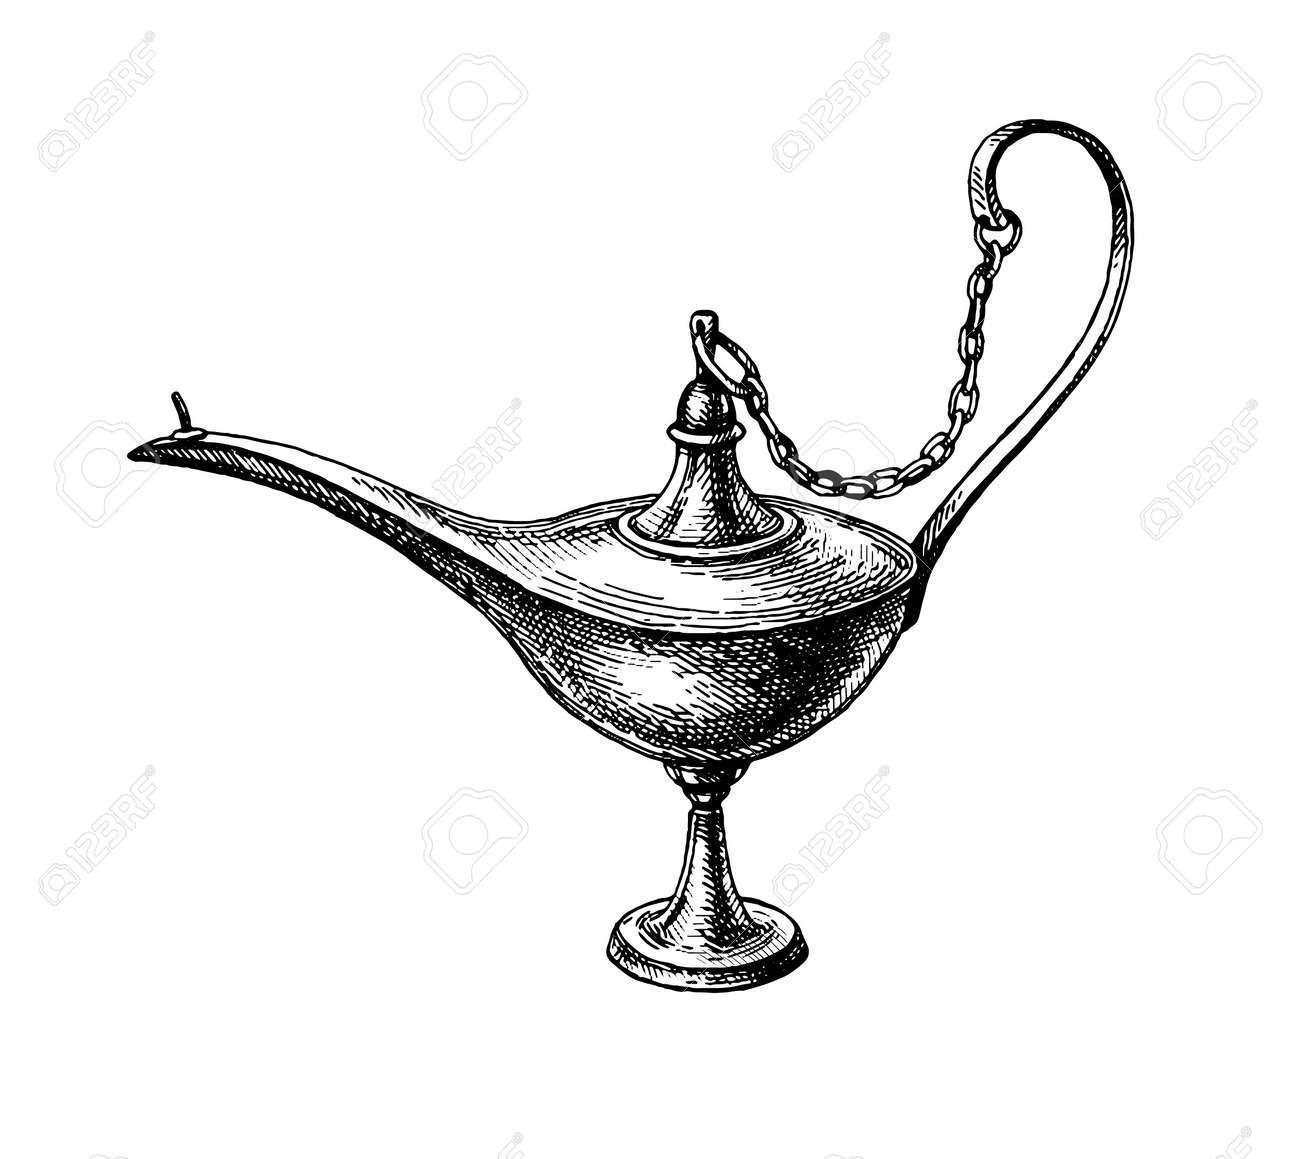 Oriental oil lamp. - 171322872